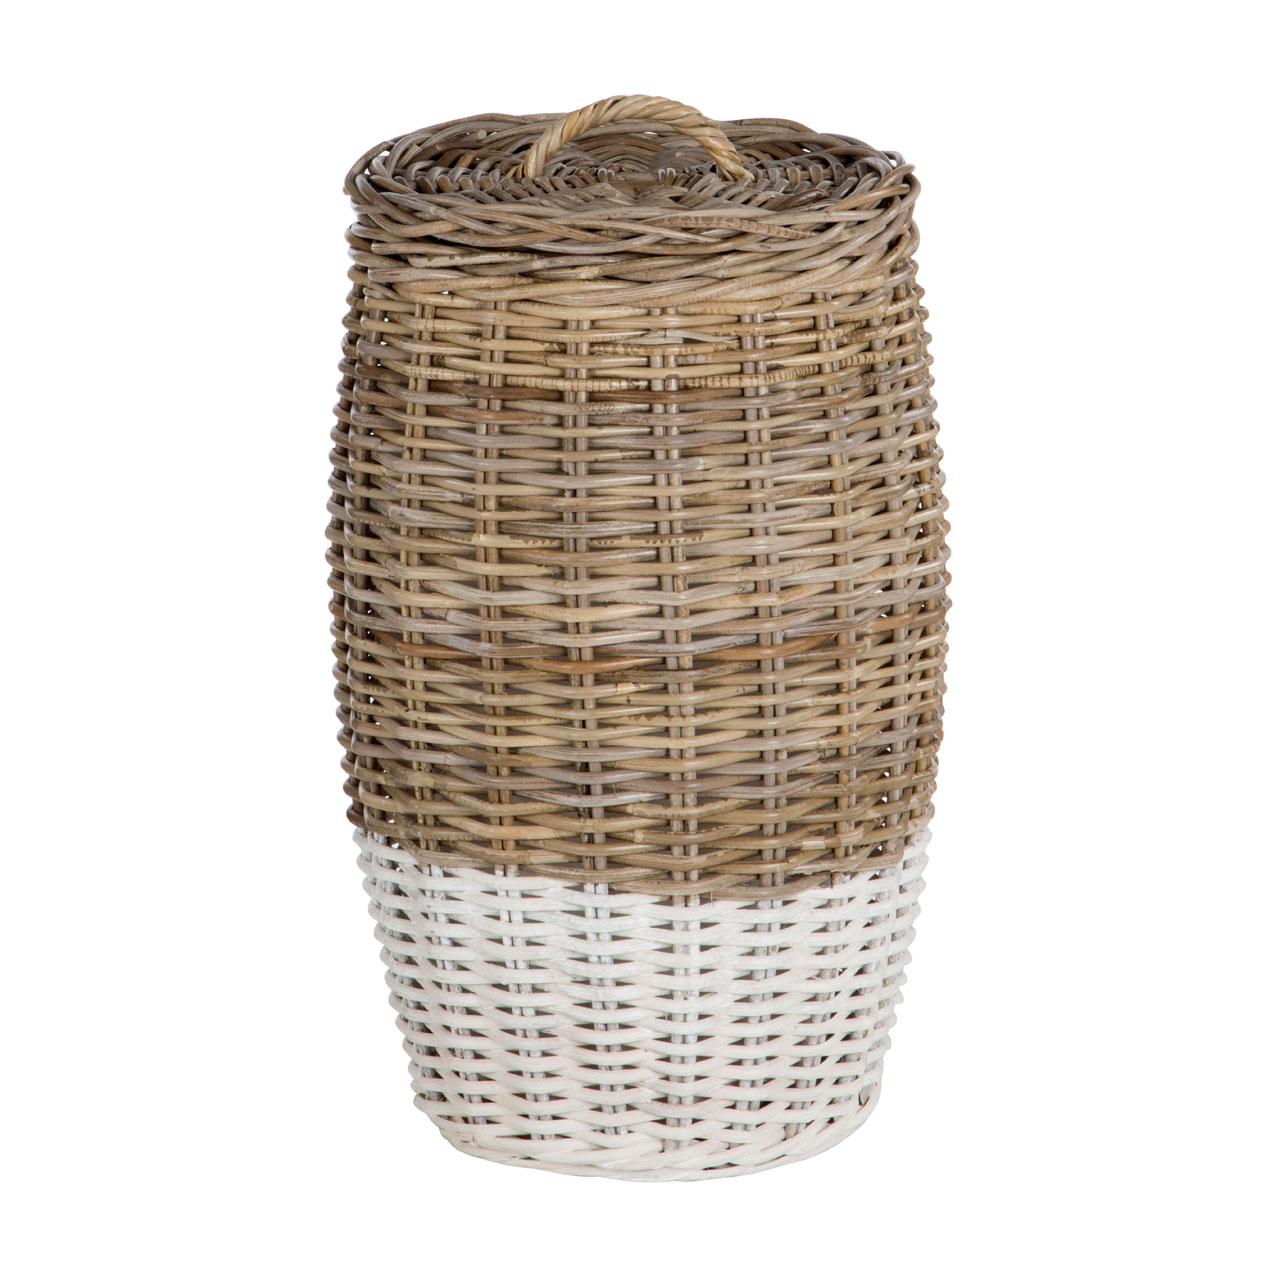 Natural Kubu Rattan Round Laundry Basket Clothes Storage Organizer Hamper